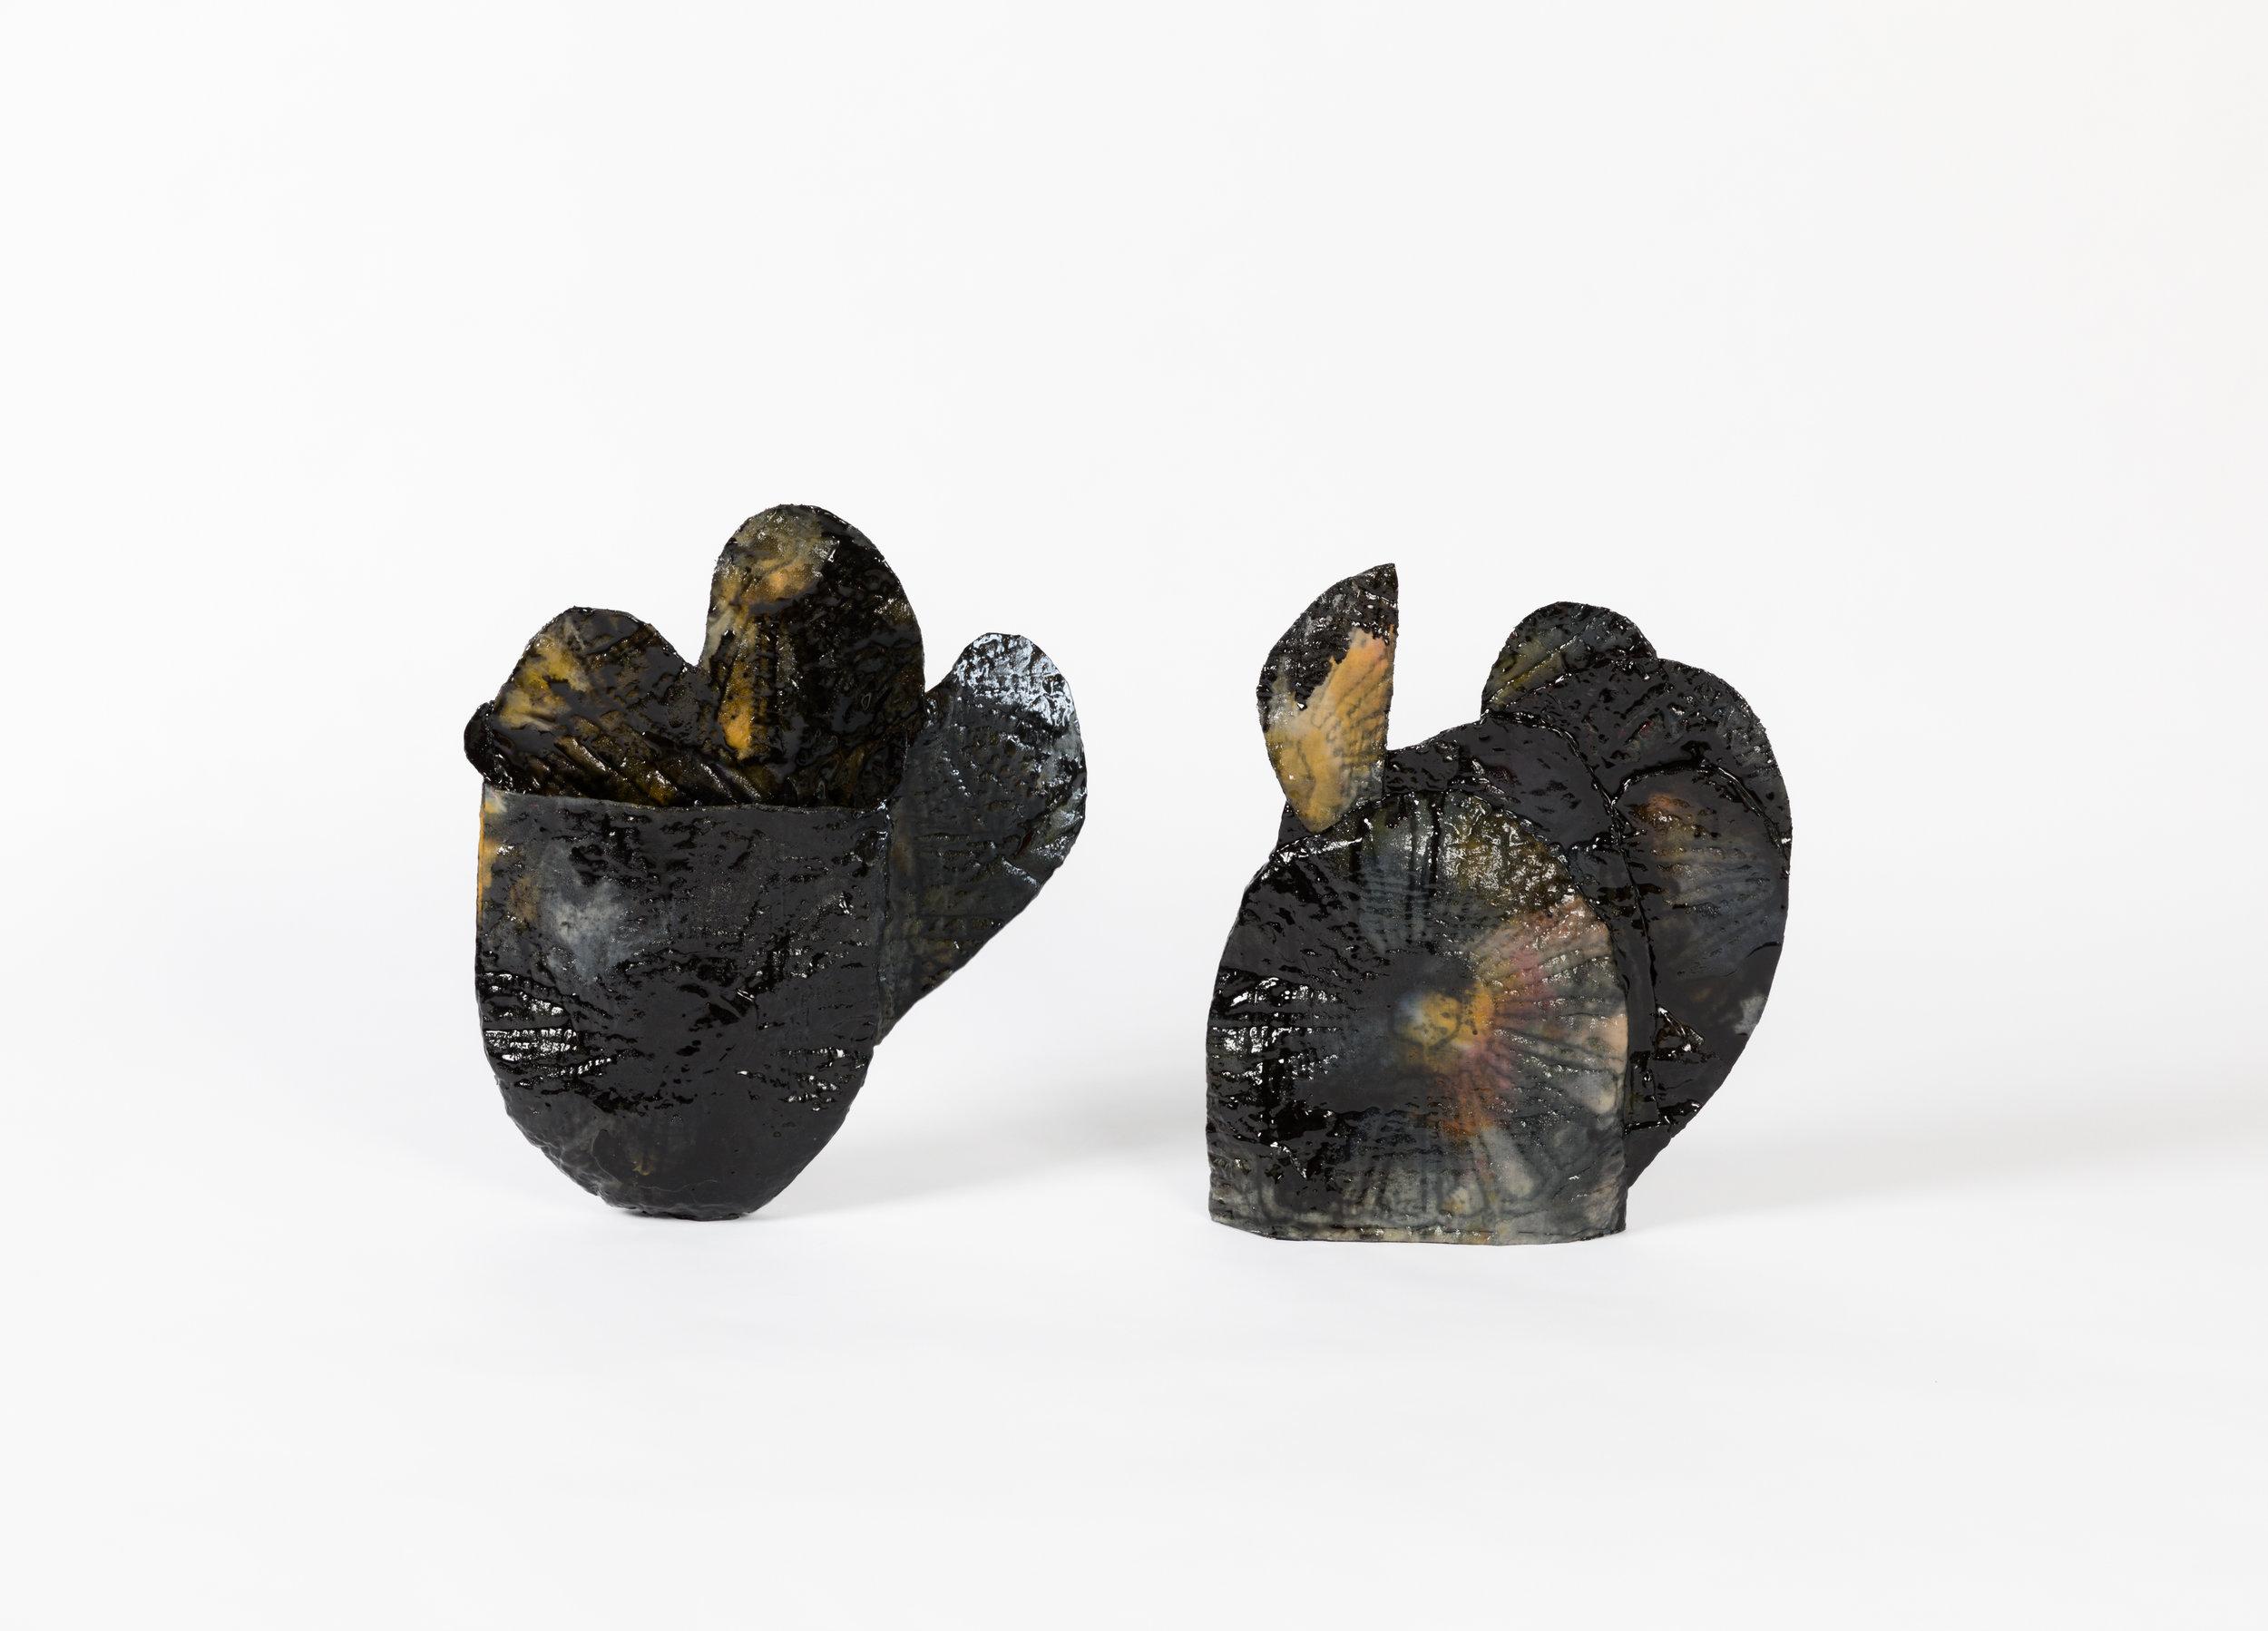 Vadis Turner,  Quilt Vessels, Landscape  (2018). Image by John Schweikert. Courtesy of Zeitgeist Gallery.